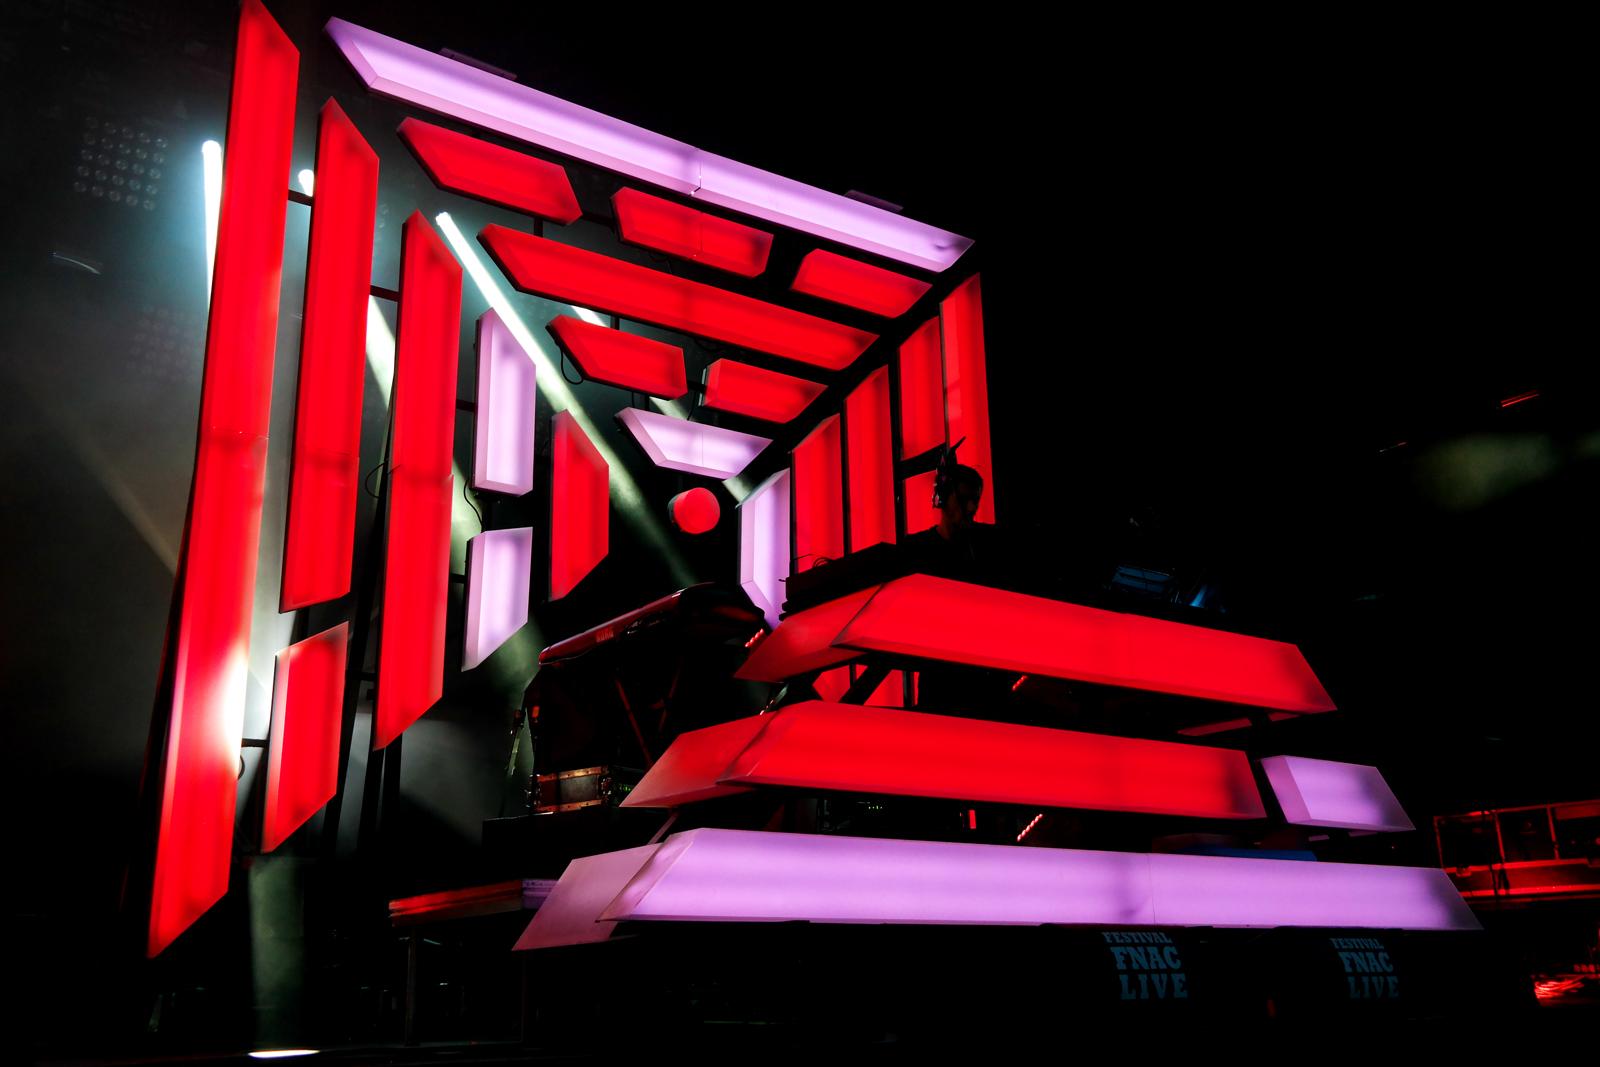 The-Avener-fnaclive-2015-festival-concert-live-dj-set-Tristan-Casara-tournée-The-wanderings-of-the-avener-tour-red-stage-photo-scène-by-united-states-of-paris-blog